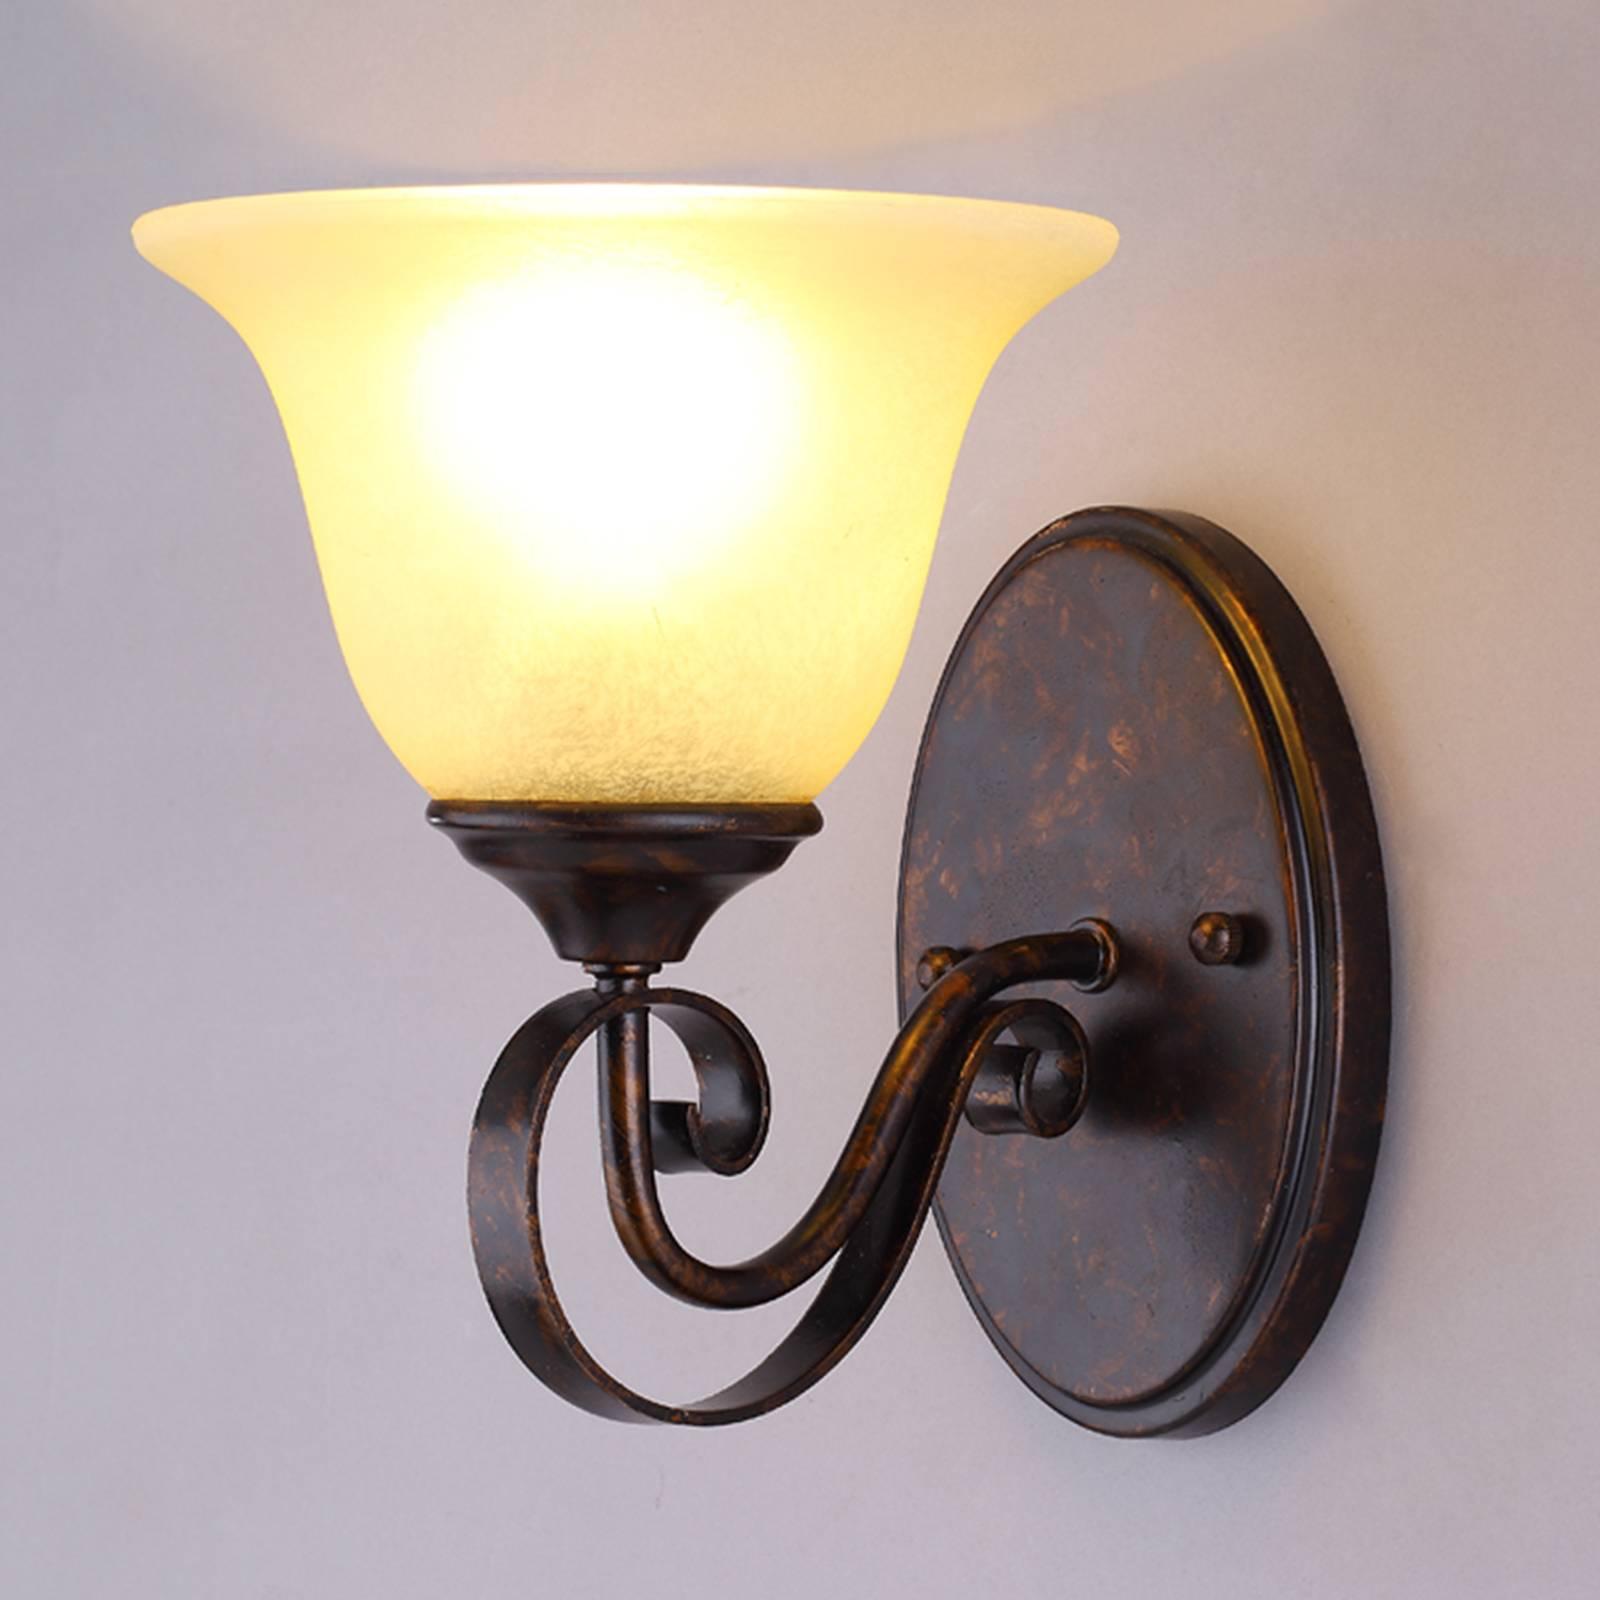 Wandlamp Svera in landelijke stijl